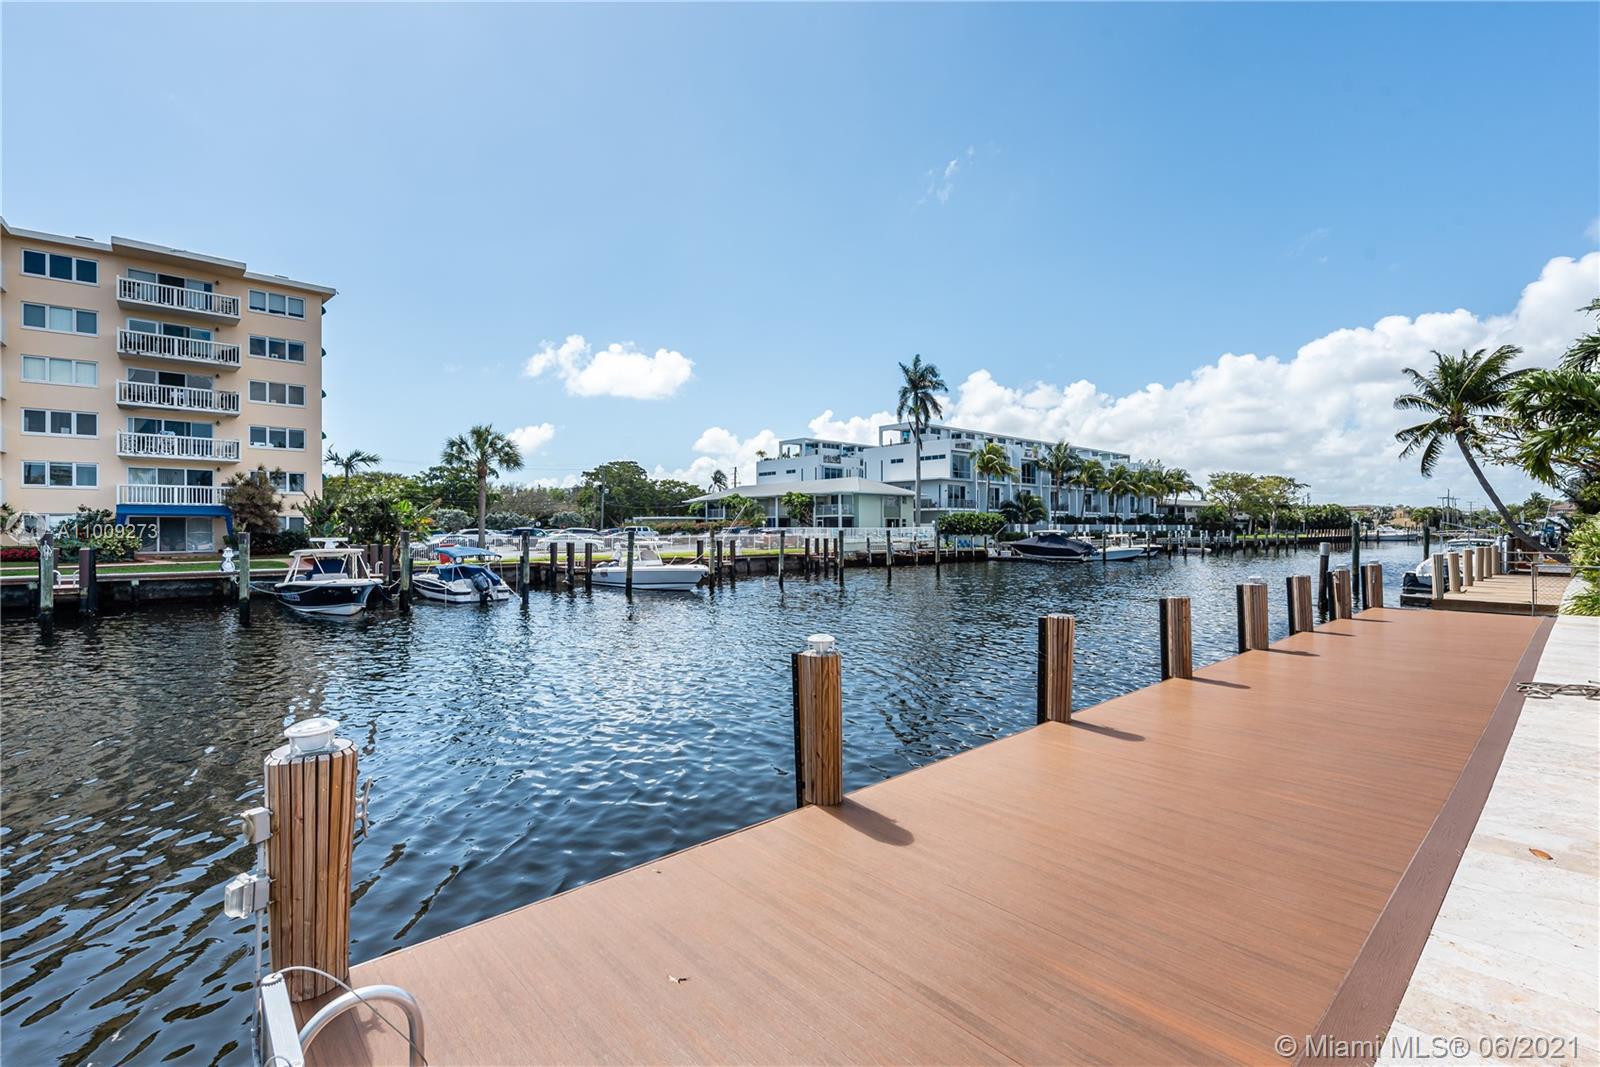 2752 3rd St, Pompano Beach, Florida 33062